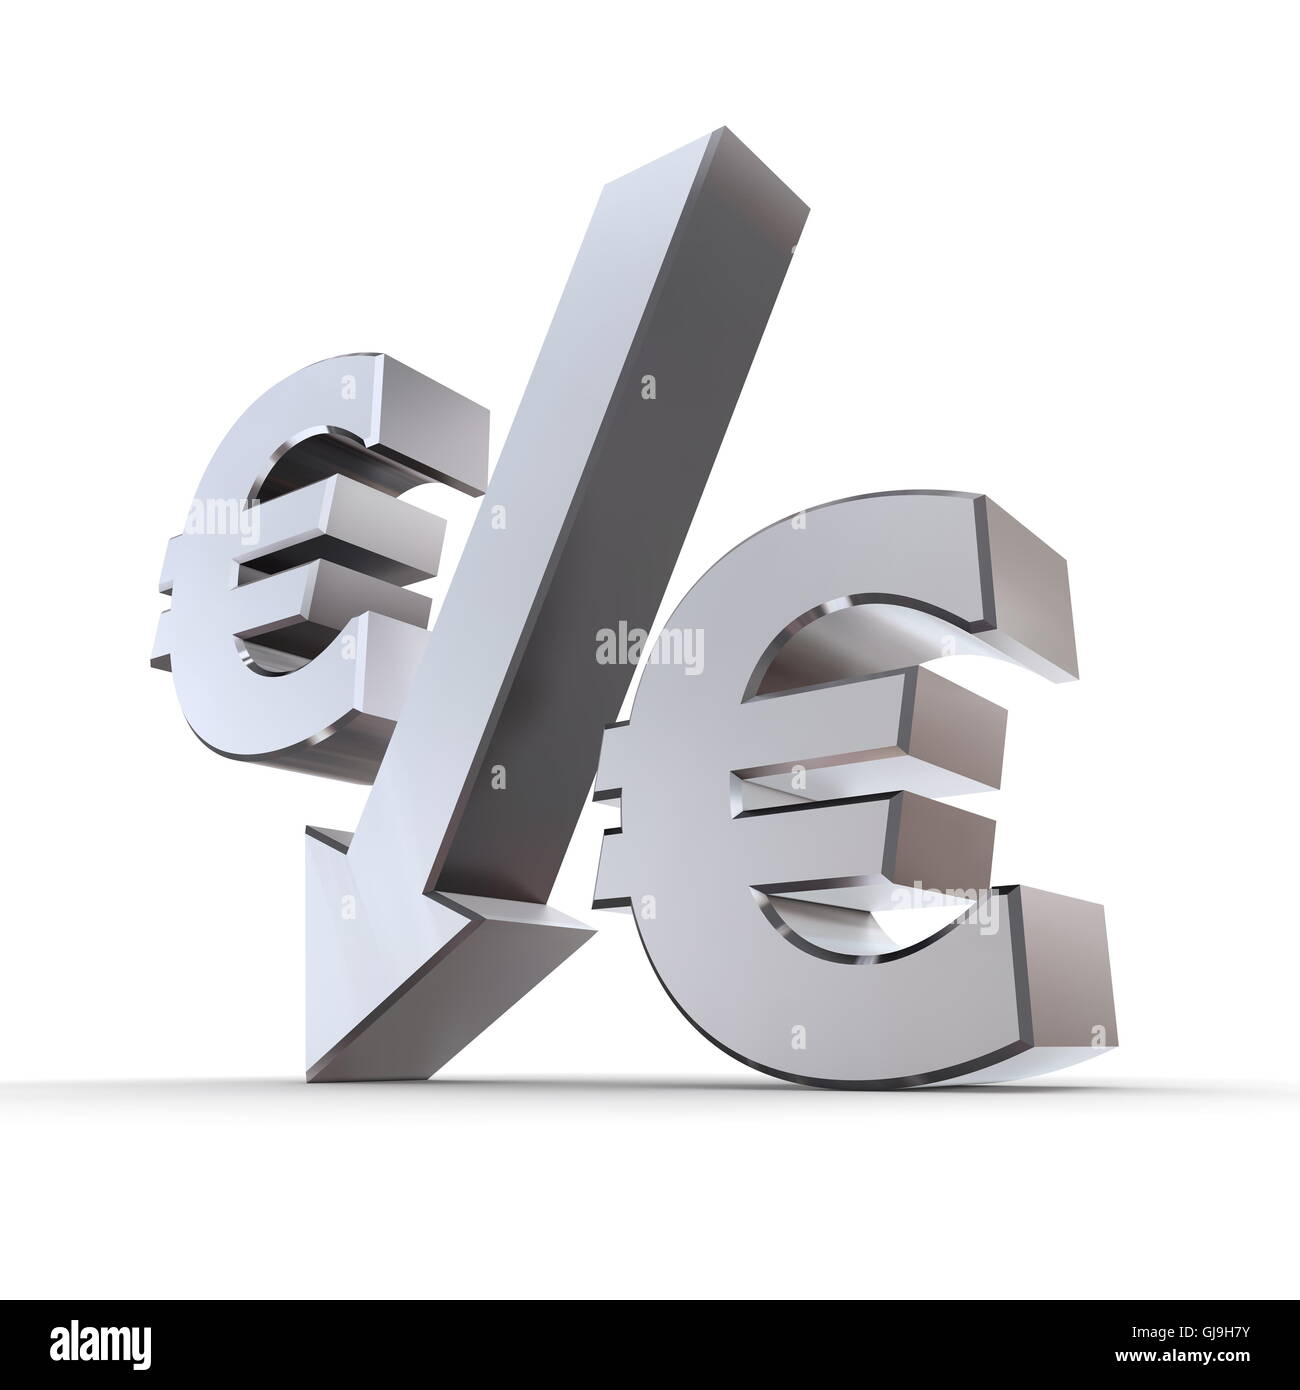 Shiny Euro Percentage Down - Stock Image